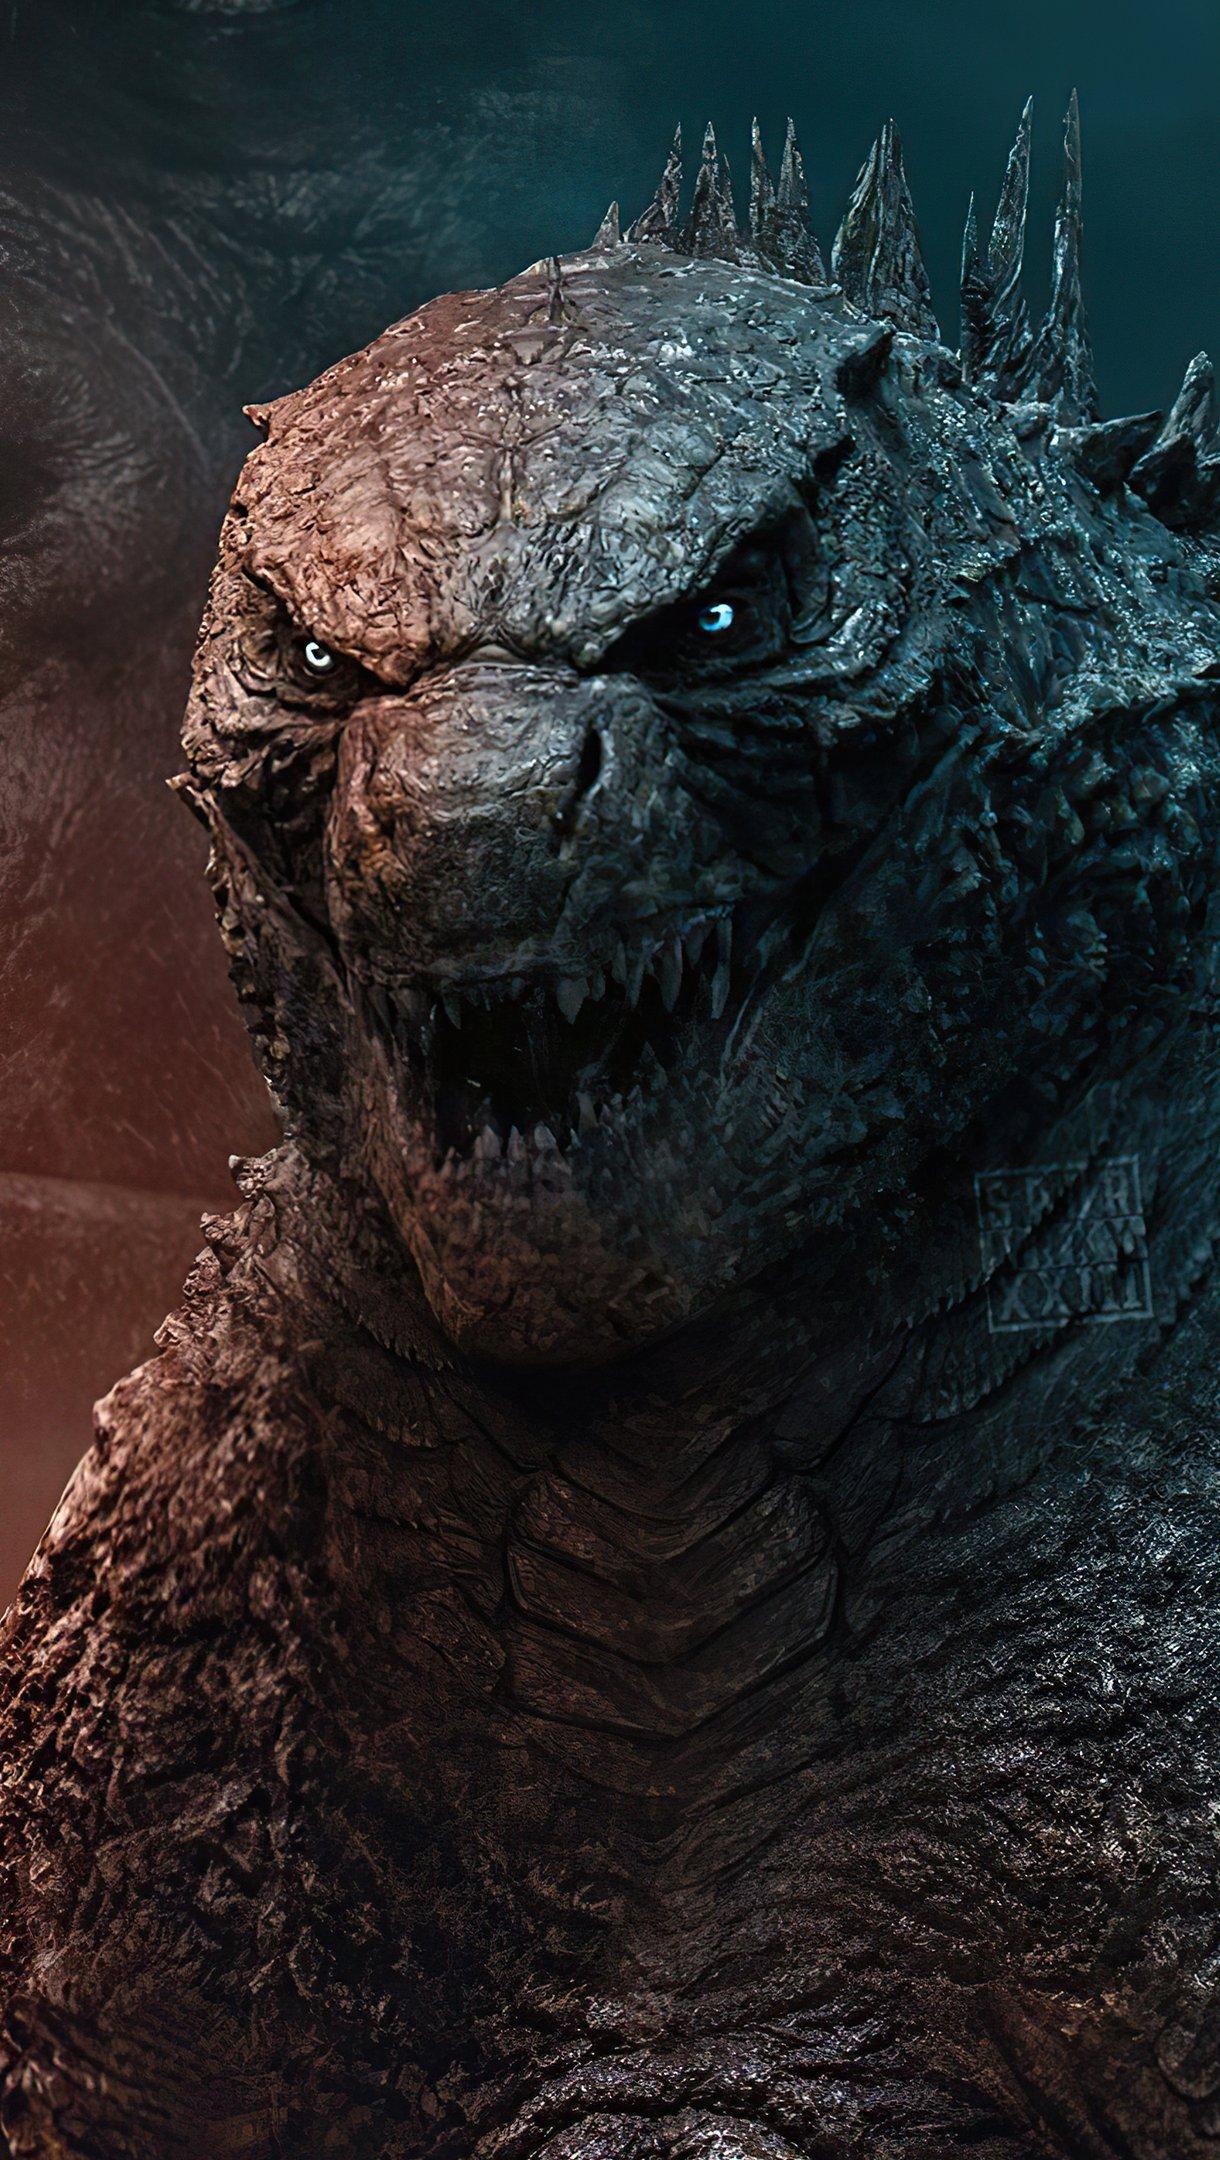 Fondos de pantalla Godzilla contra King Kong 2021 Vertical